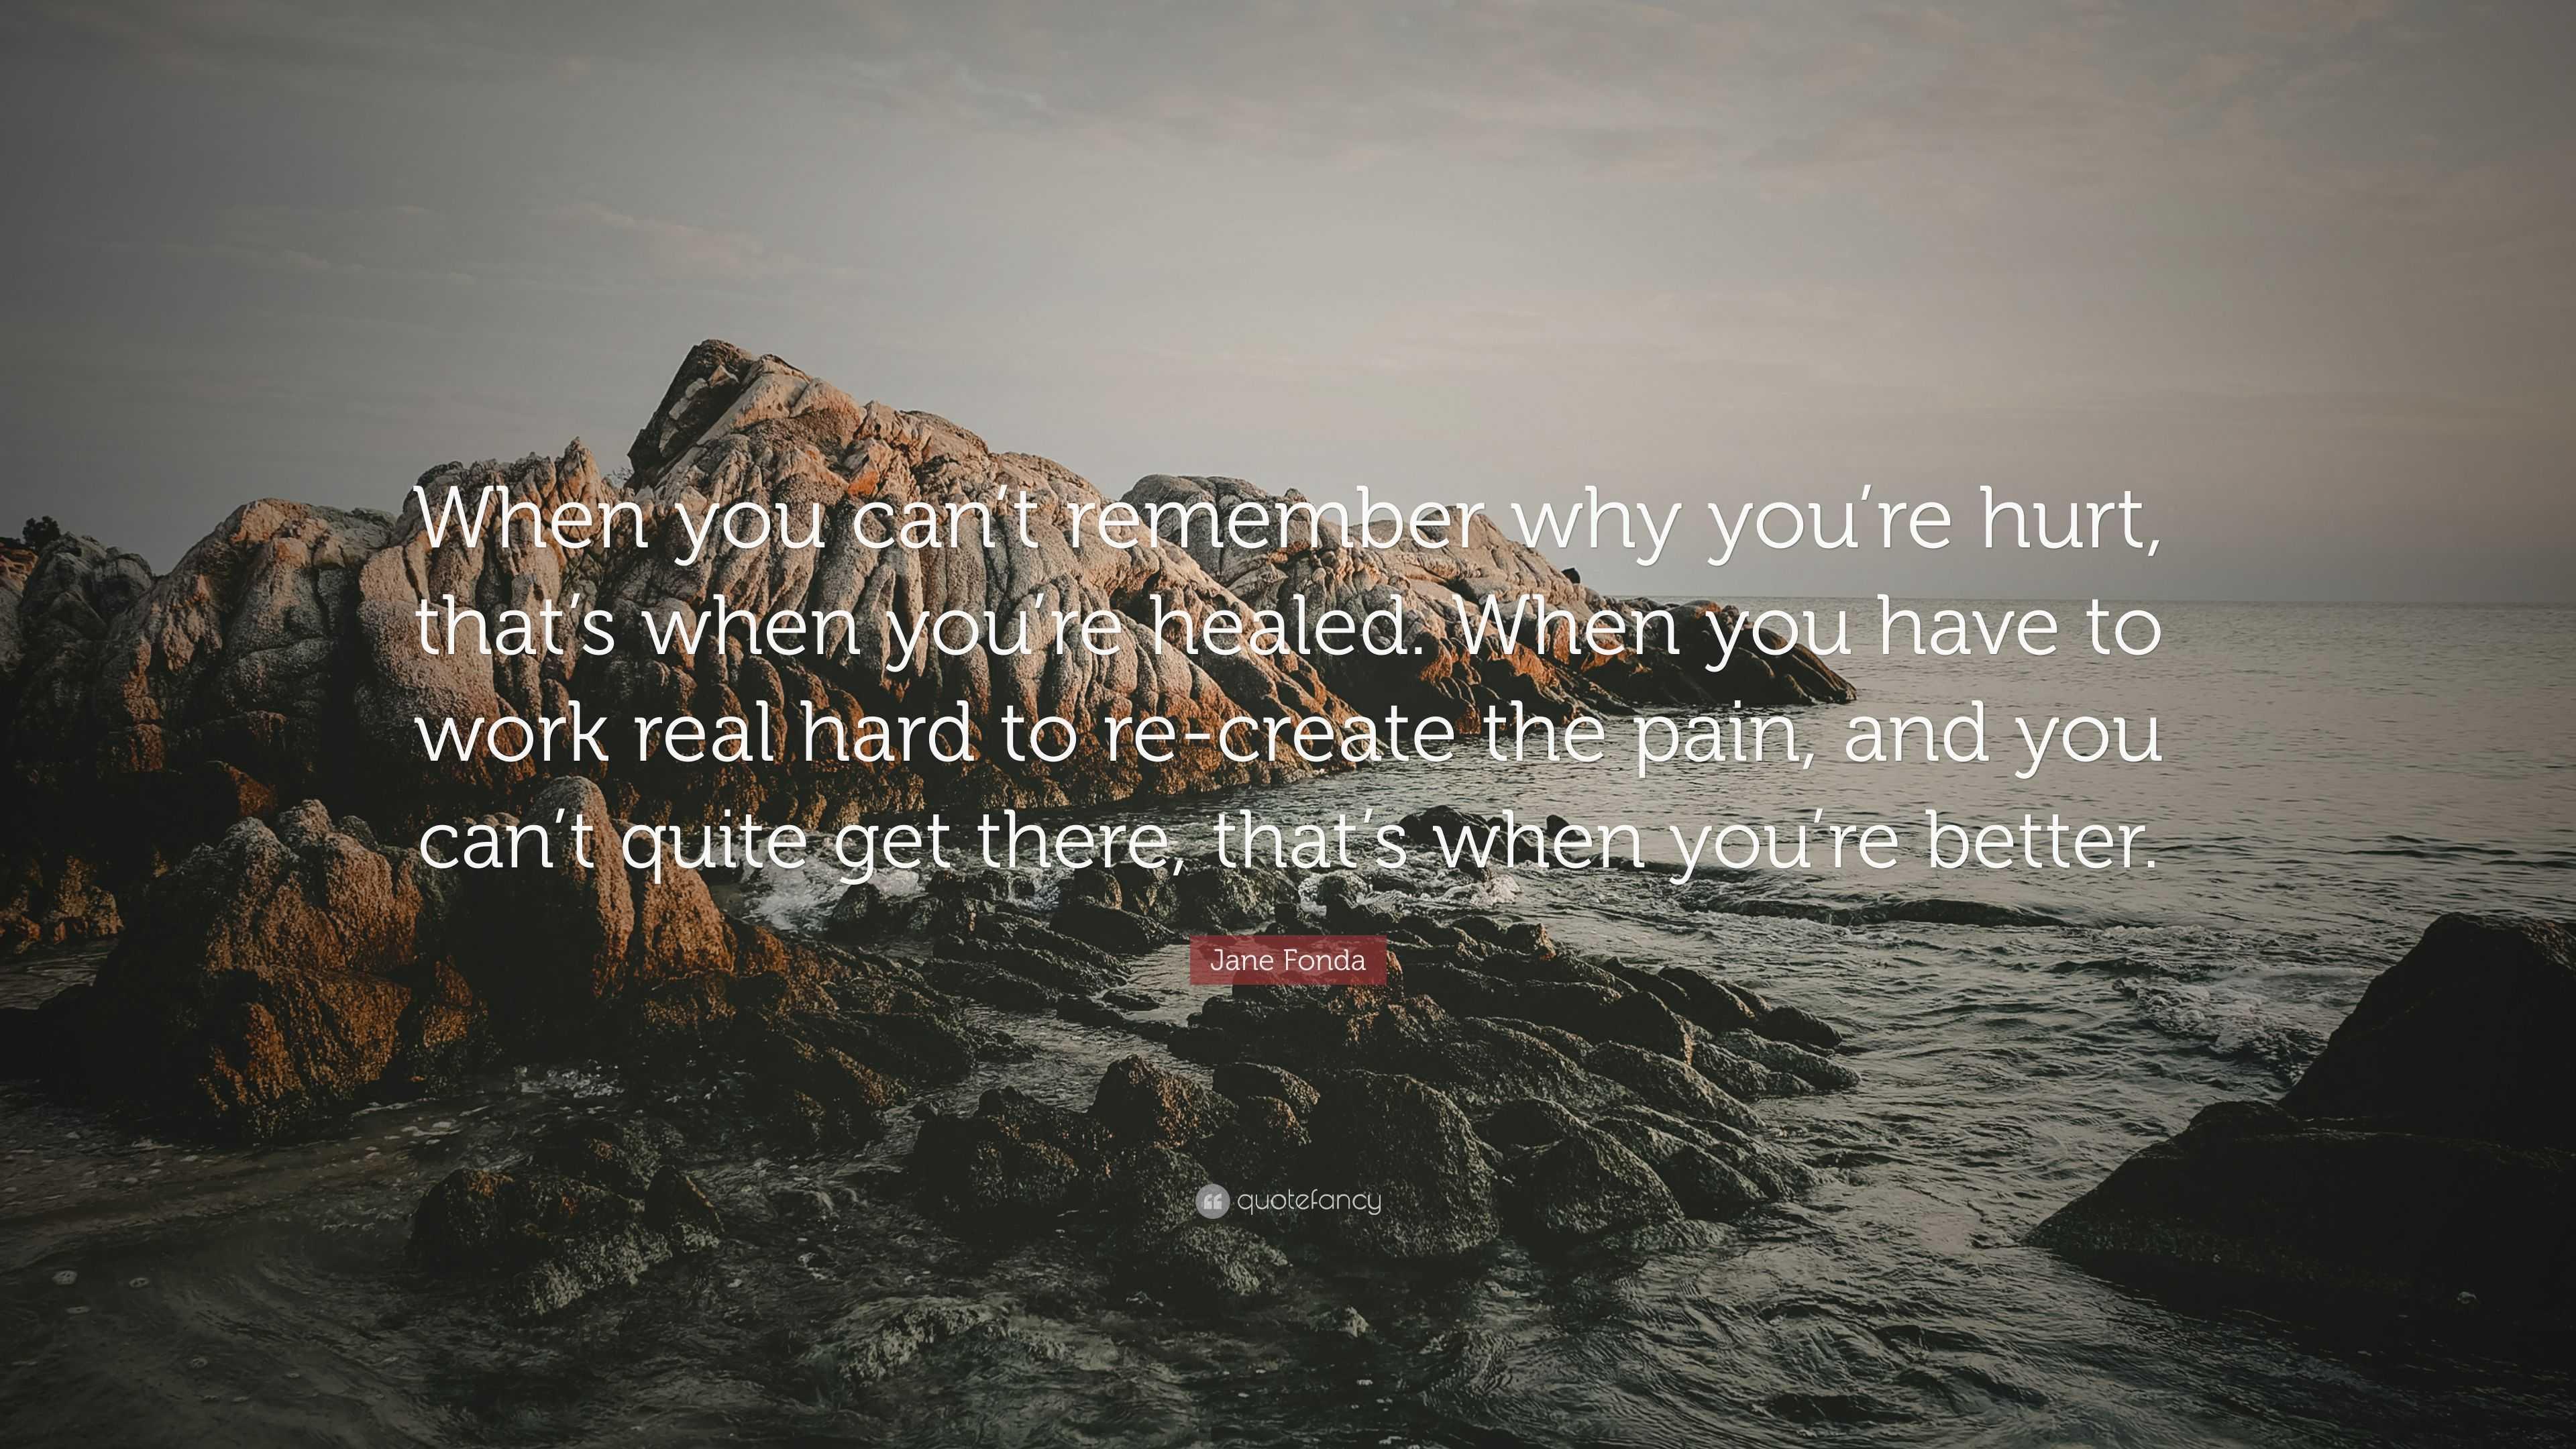 Jane Fonda Quote: U201cWhen You Canu0027t Remember Why Youu0027re Hurt